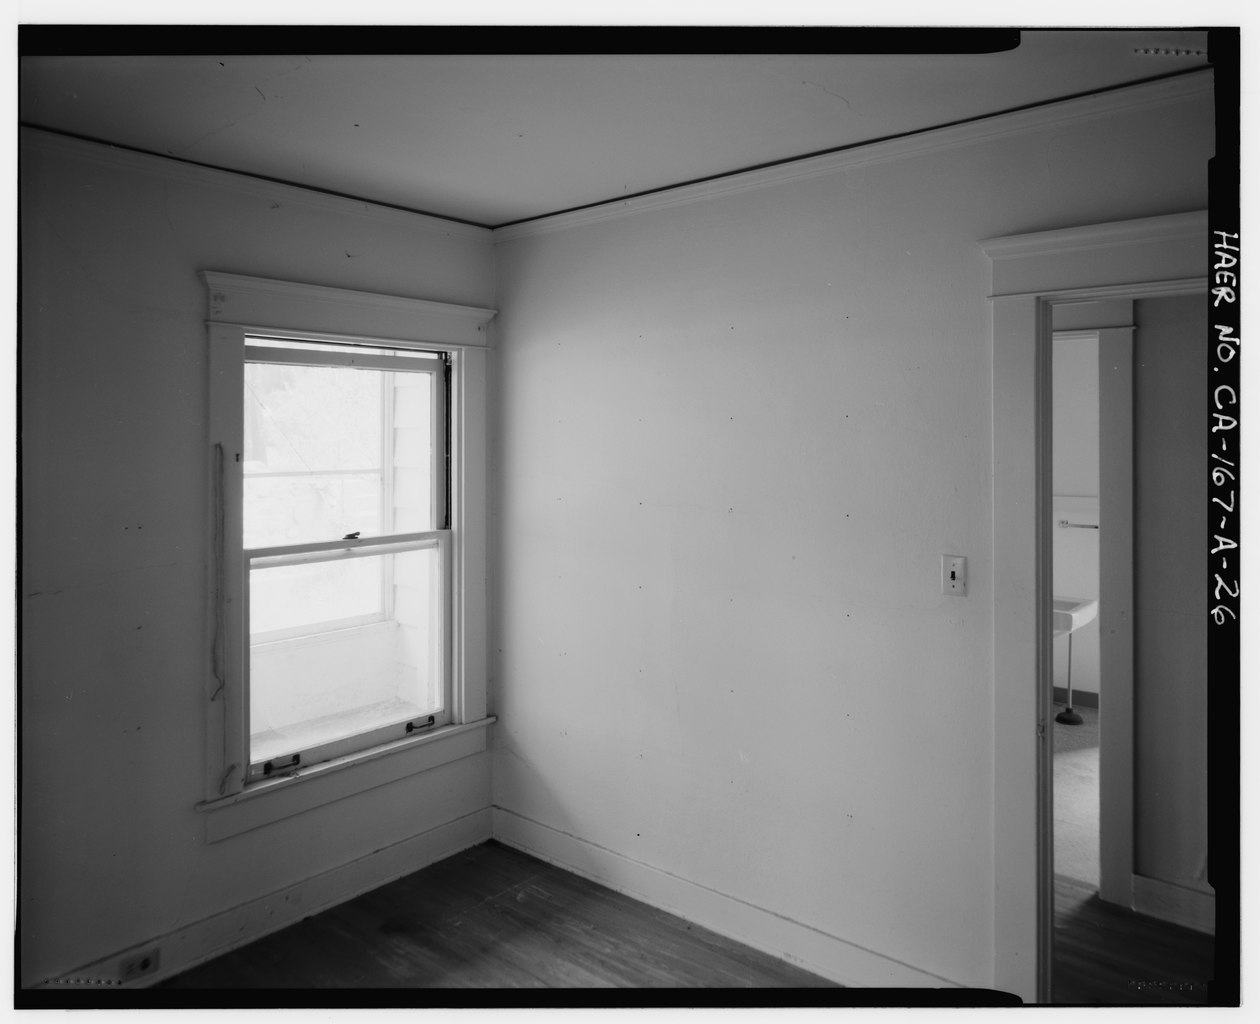 File Bedroom 2 Interior Showing Open Door To Hall With